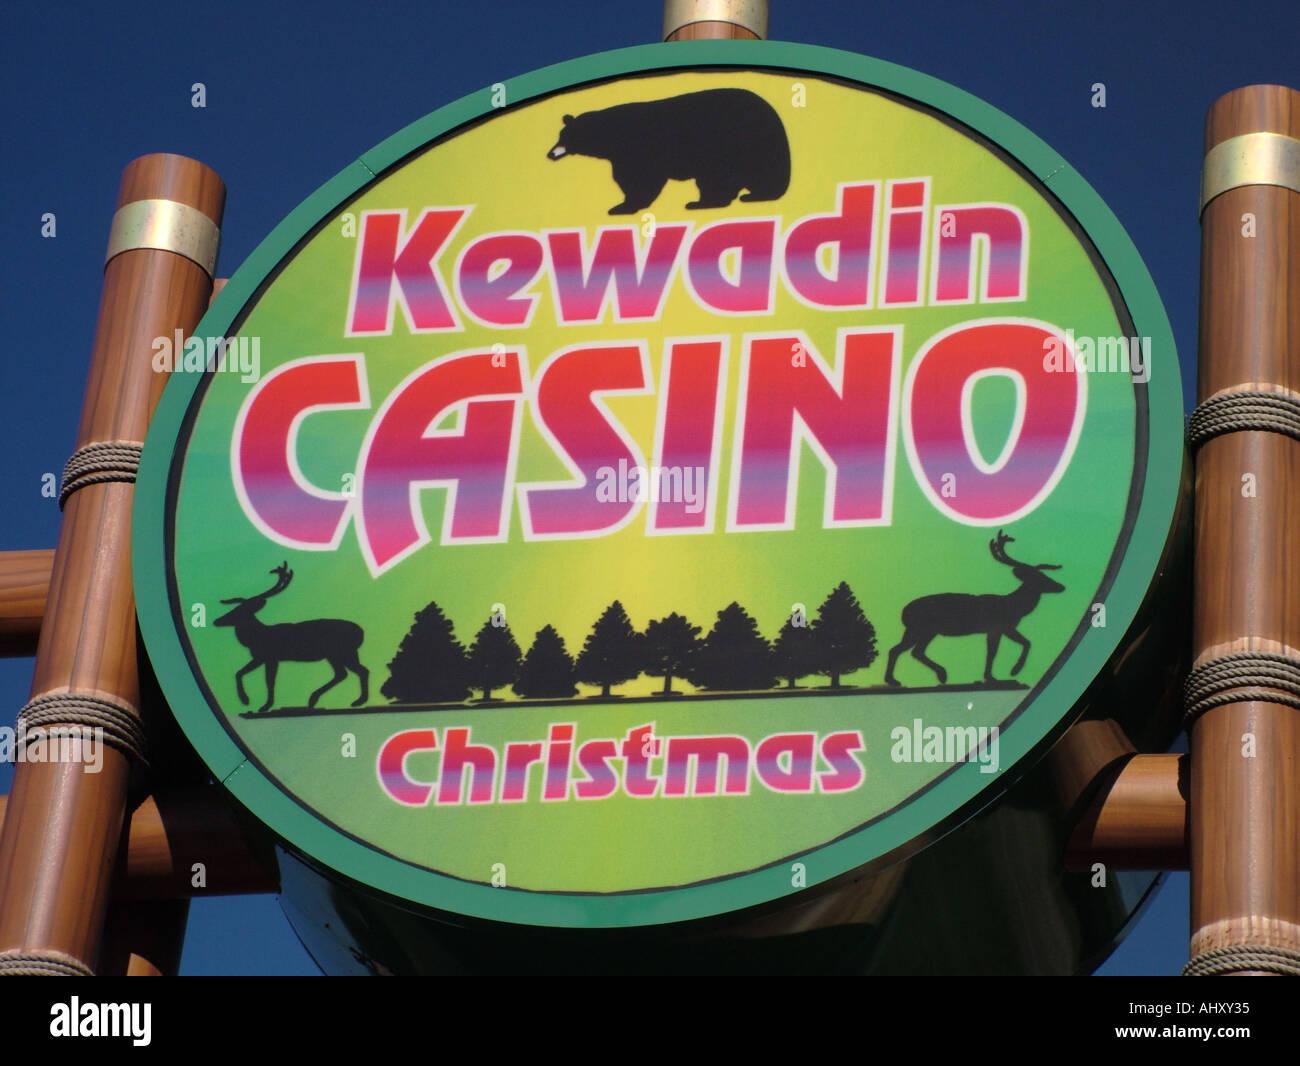 Kewadin Stock Photos & Kewadin Stock Images - Alamy